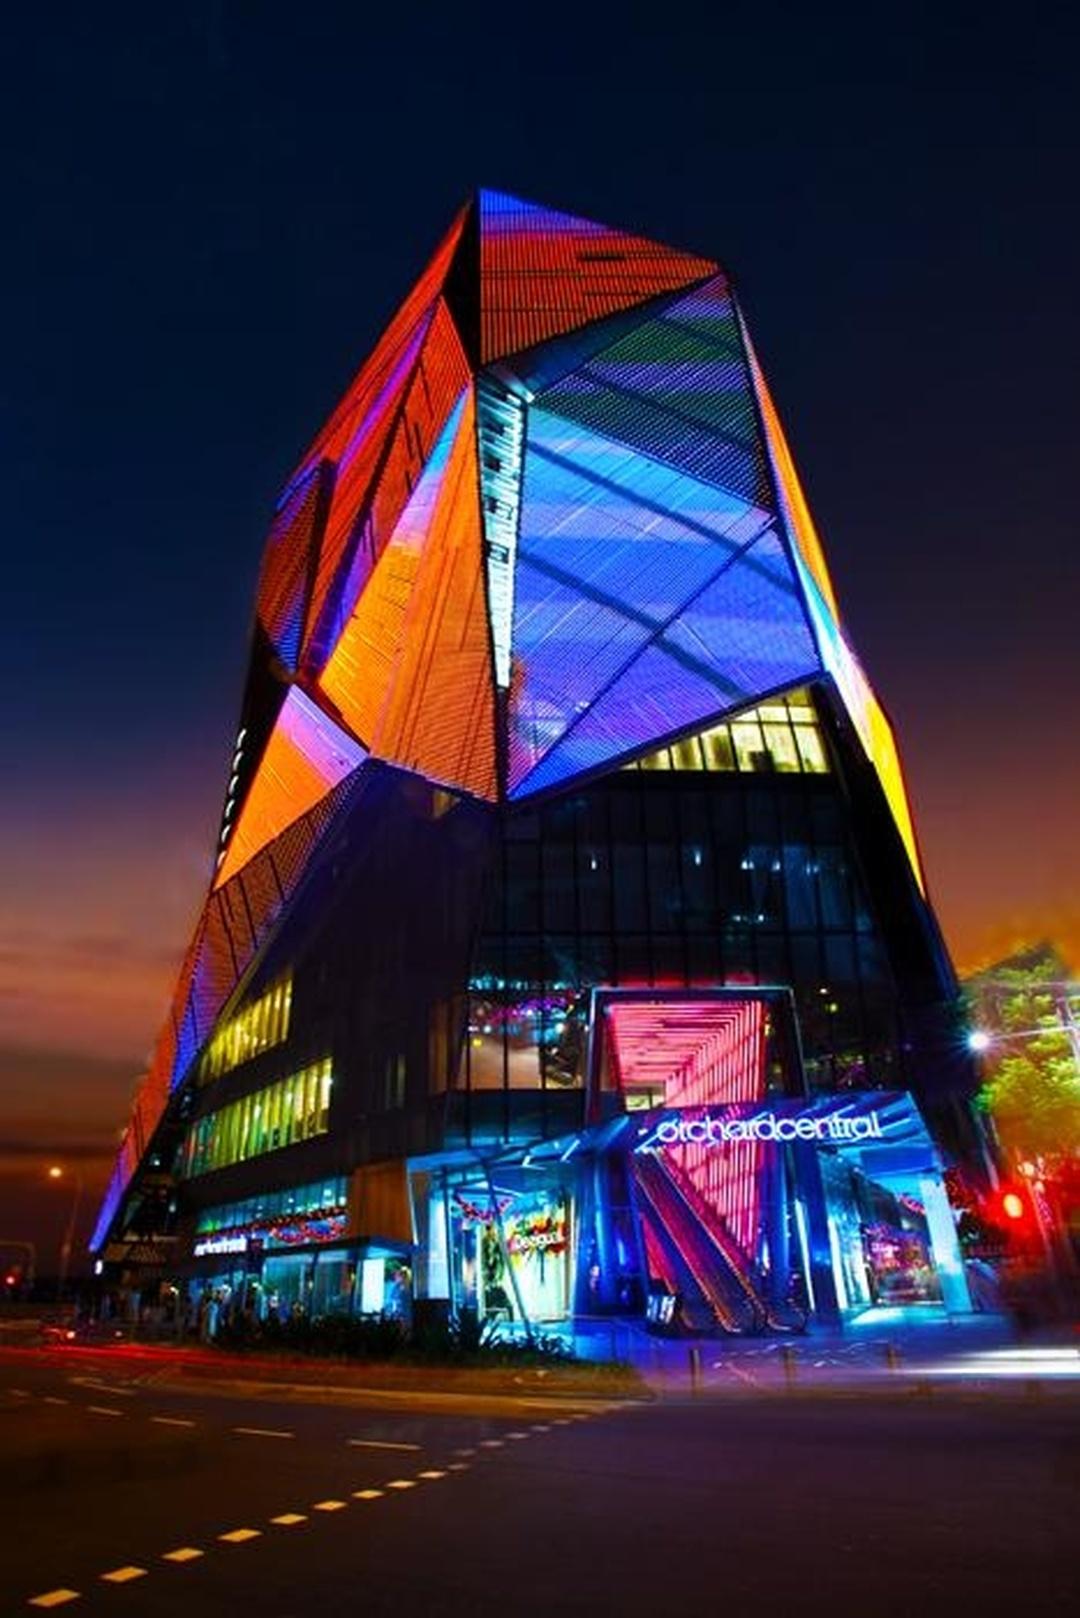 Centro comercial - Orchard Central , Singapore